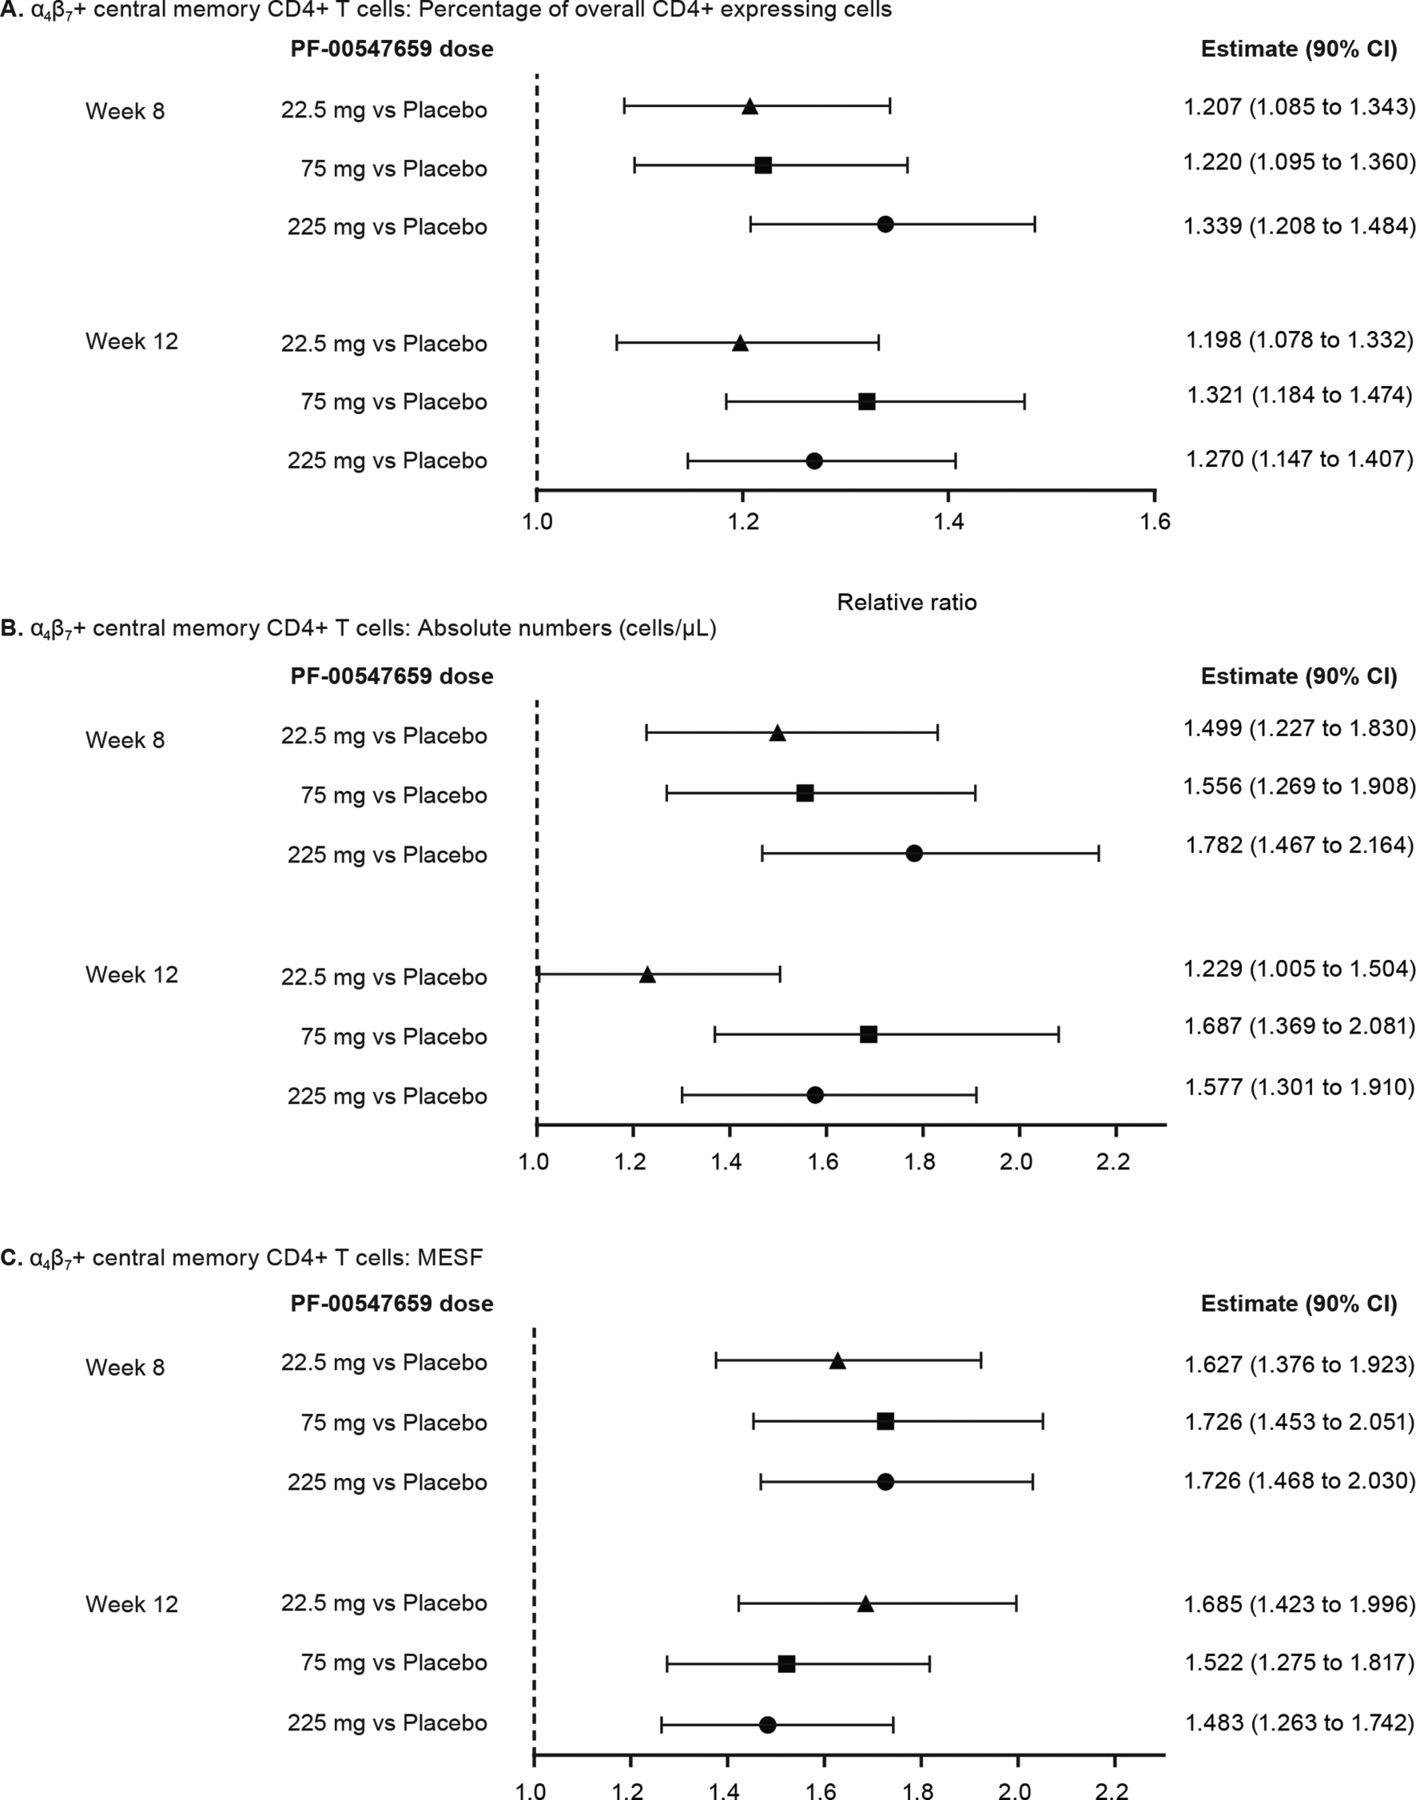 Phase II evaluation of anti-MAdCAM antibody PF-00547659 in